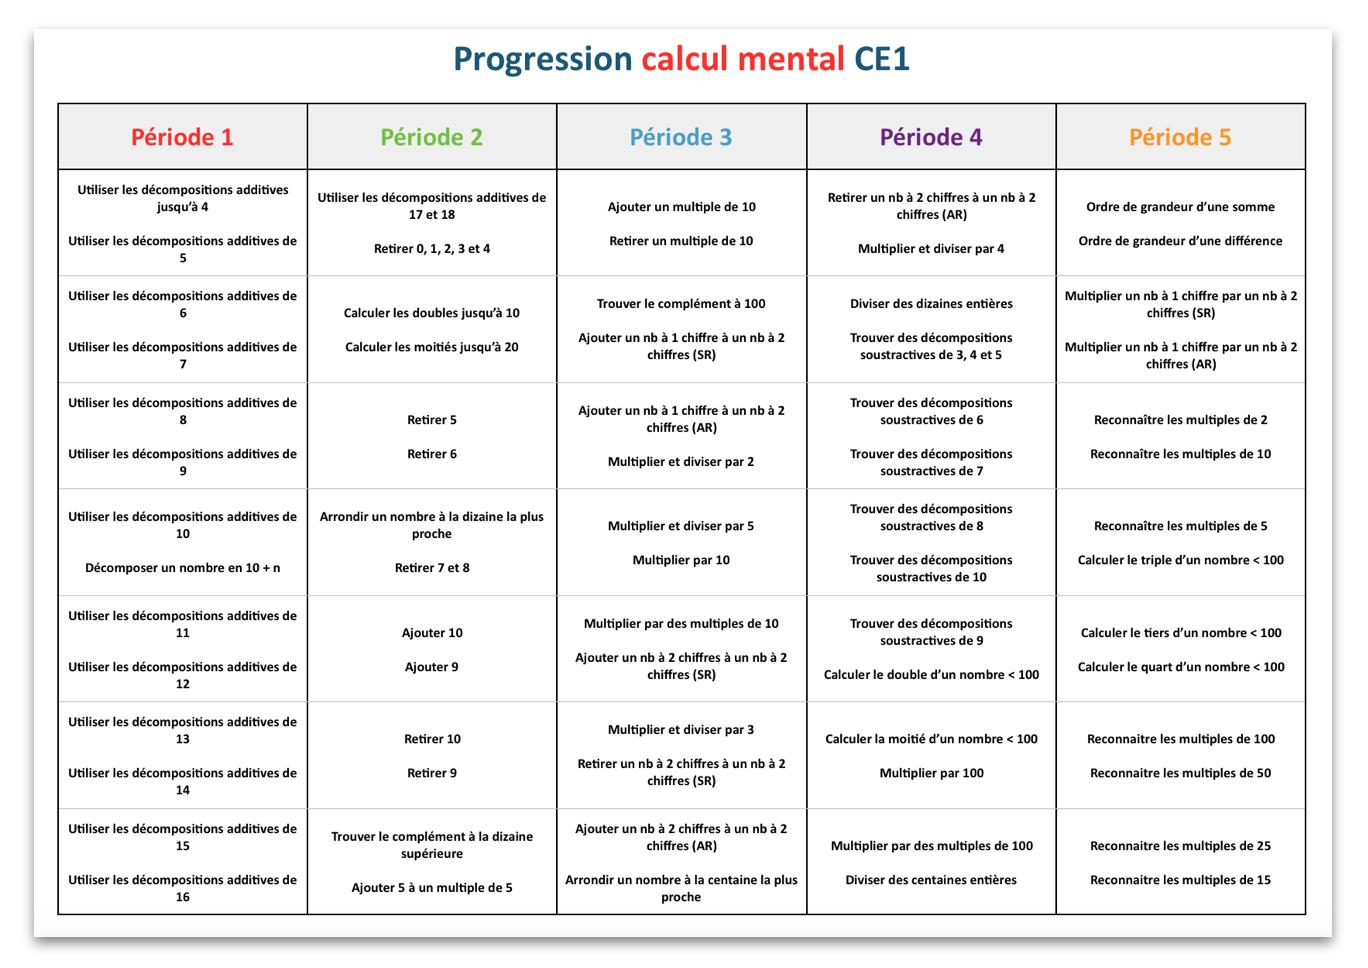 Häufig Progression calcul mental CE1 | Progression ce1 ce2 | Pinterest  DH21